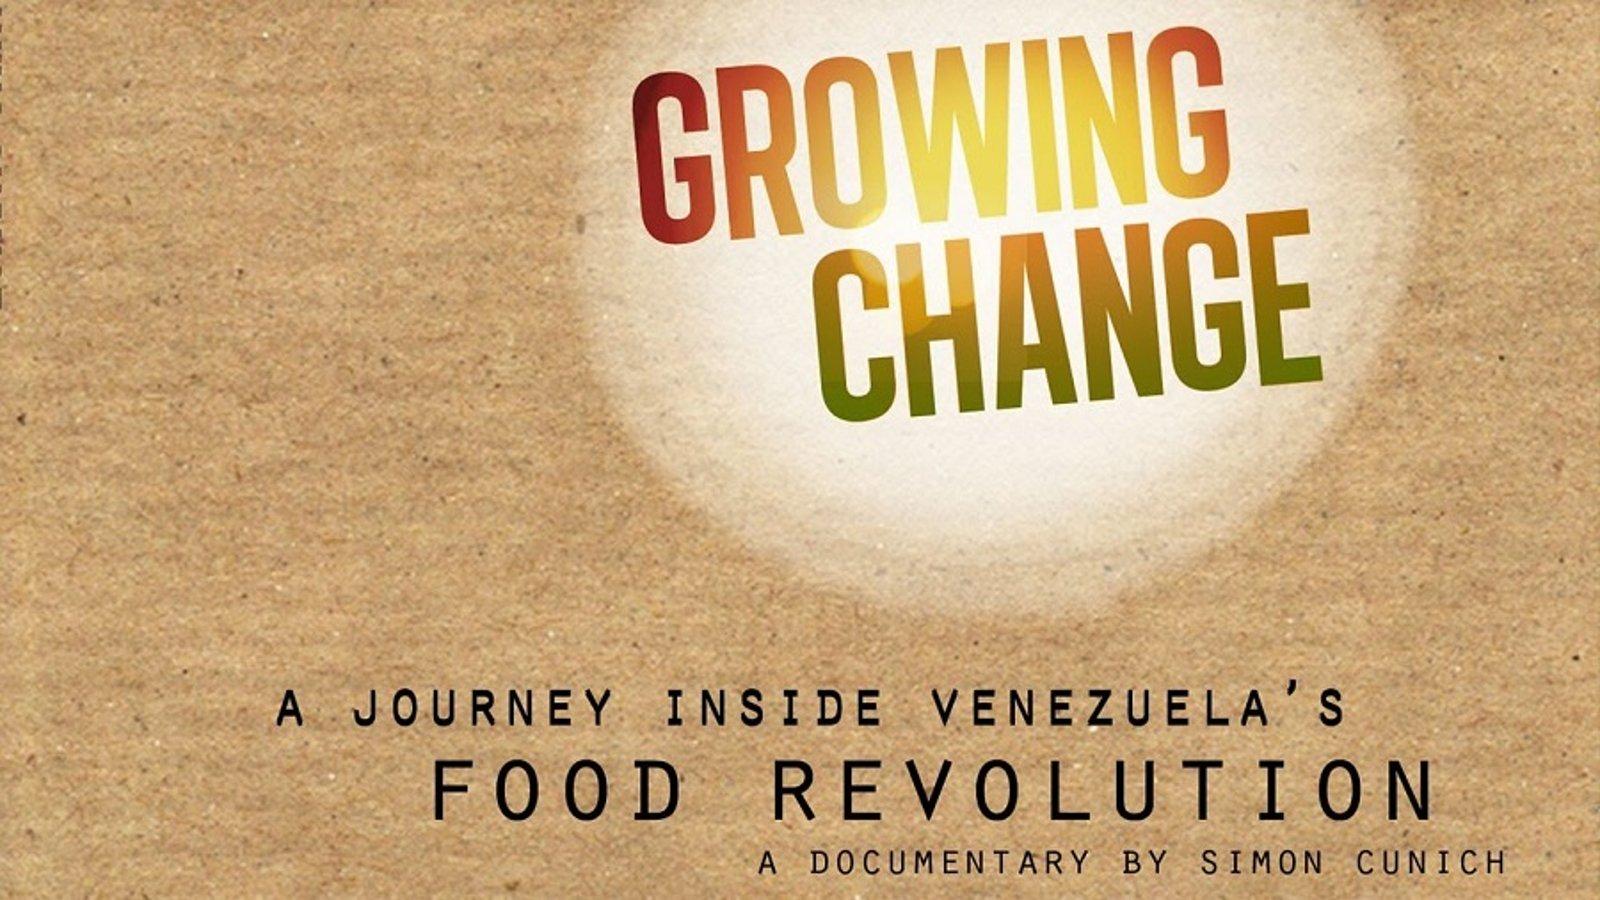 Growing Change - A Journey Inside Venezuela's Food Revolution